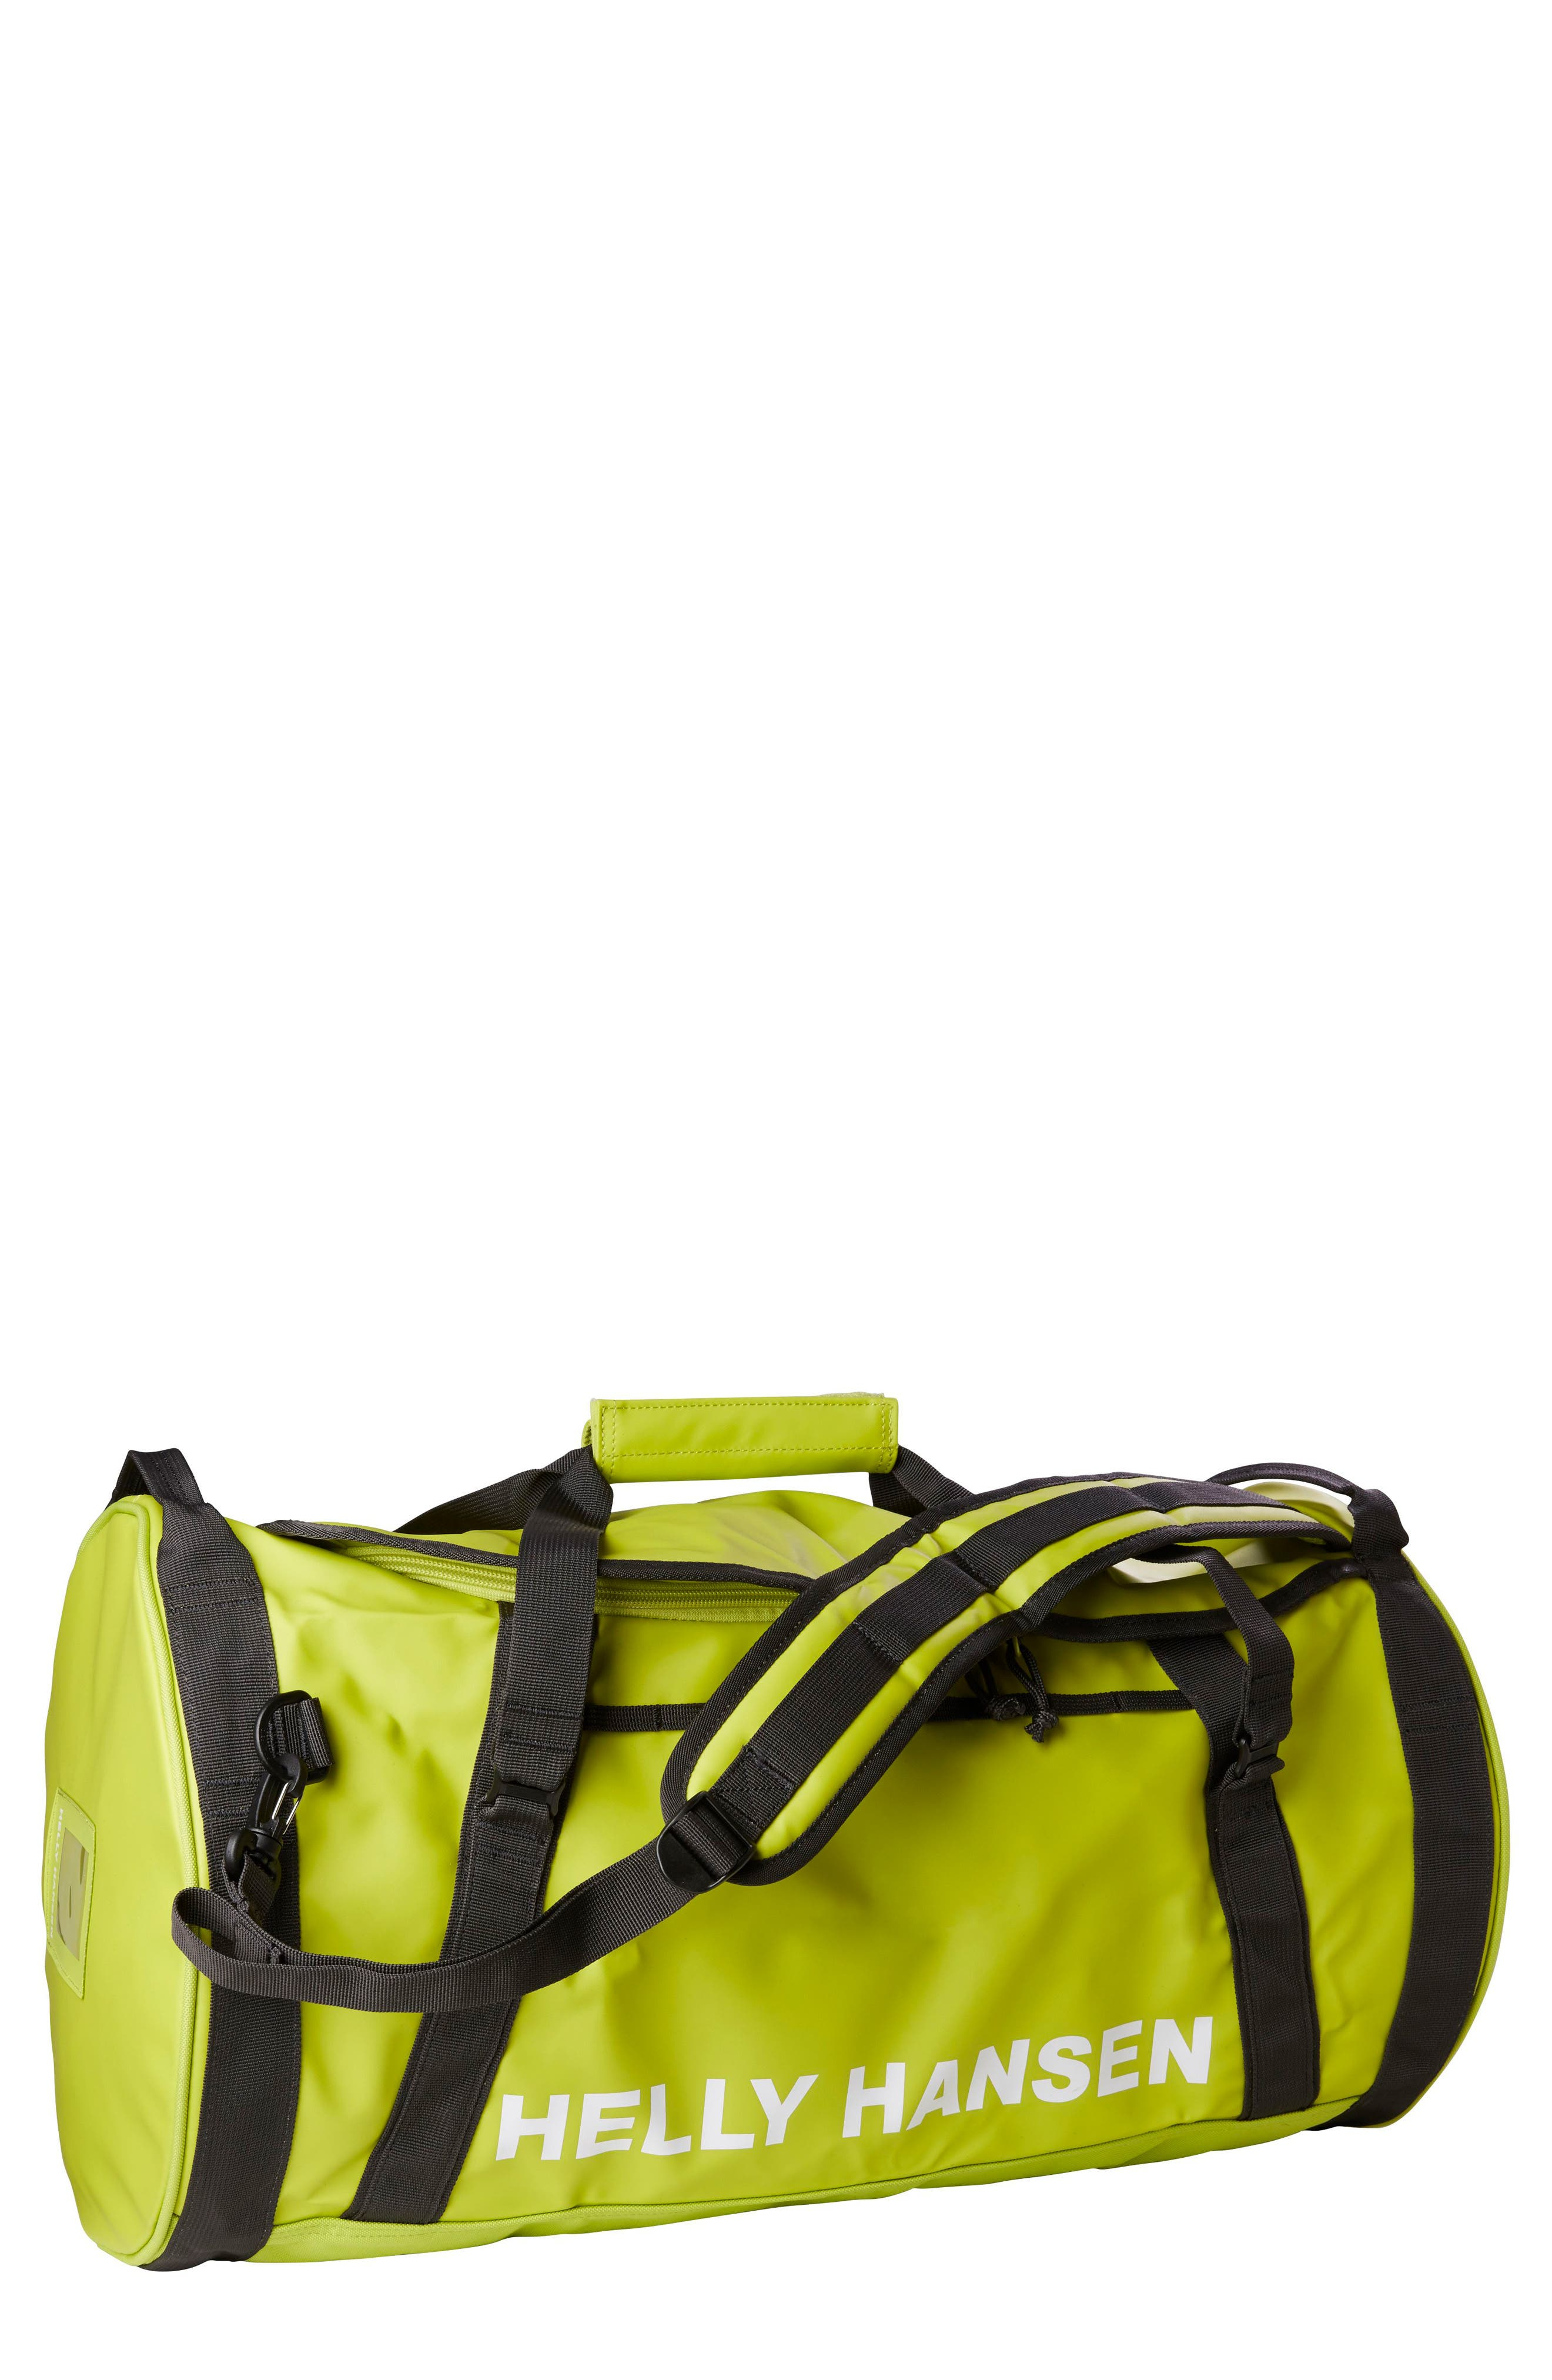 HELLY HANSEN 50-Liter Duffel Bag, Main, color, 009